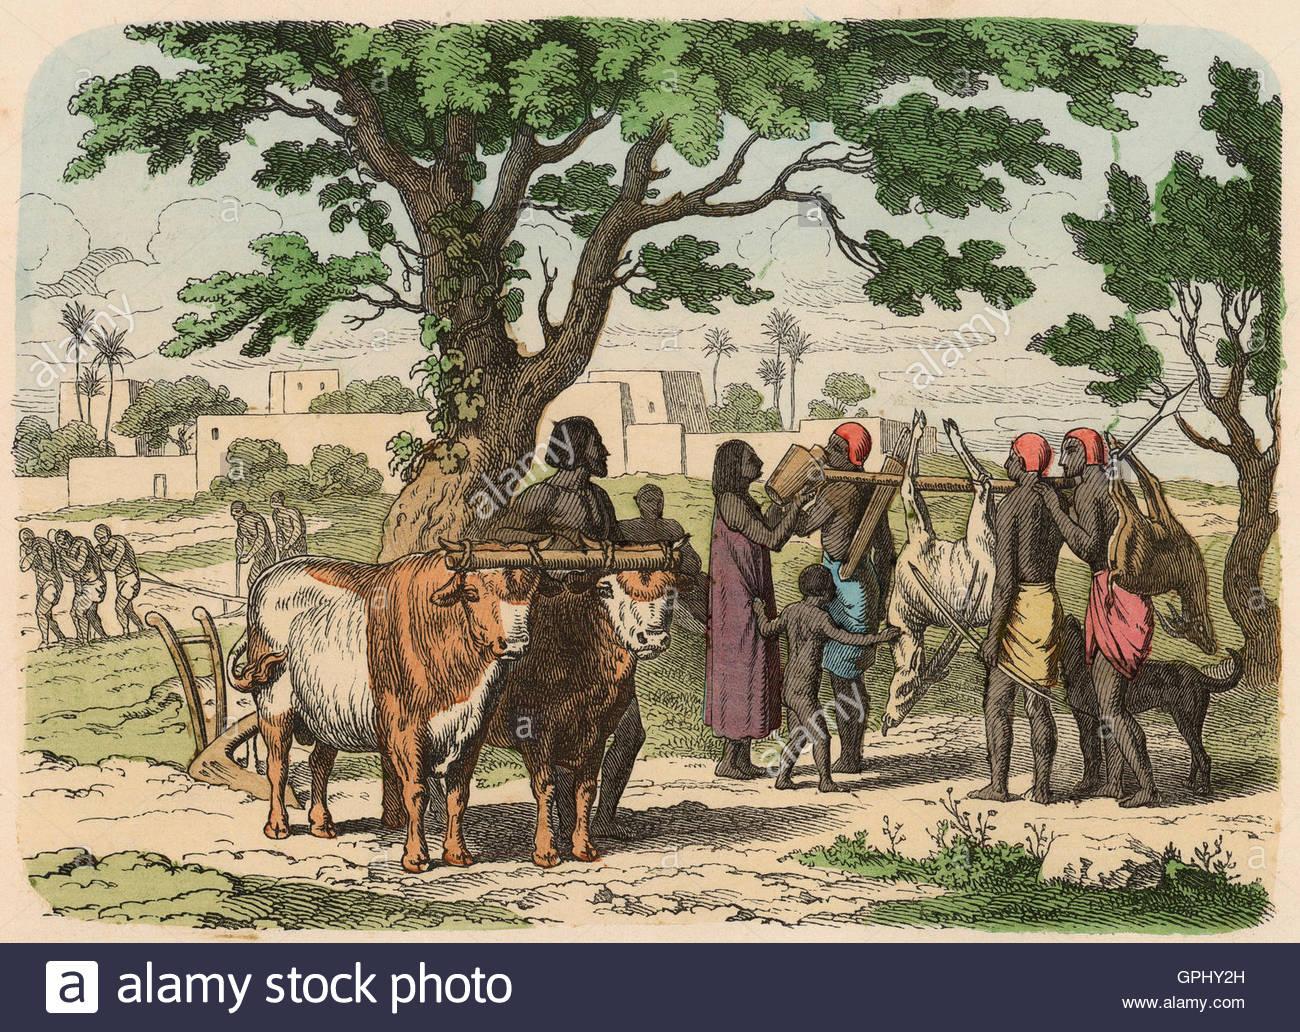 Ancient Egypt Farming Stock Photos & Ancient Egypt Farming Stock ...